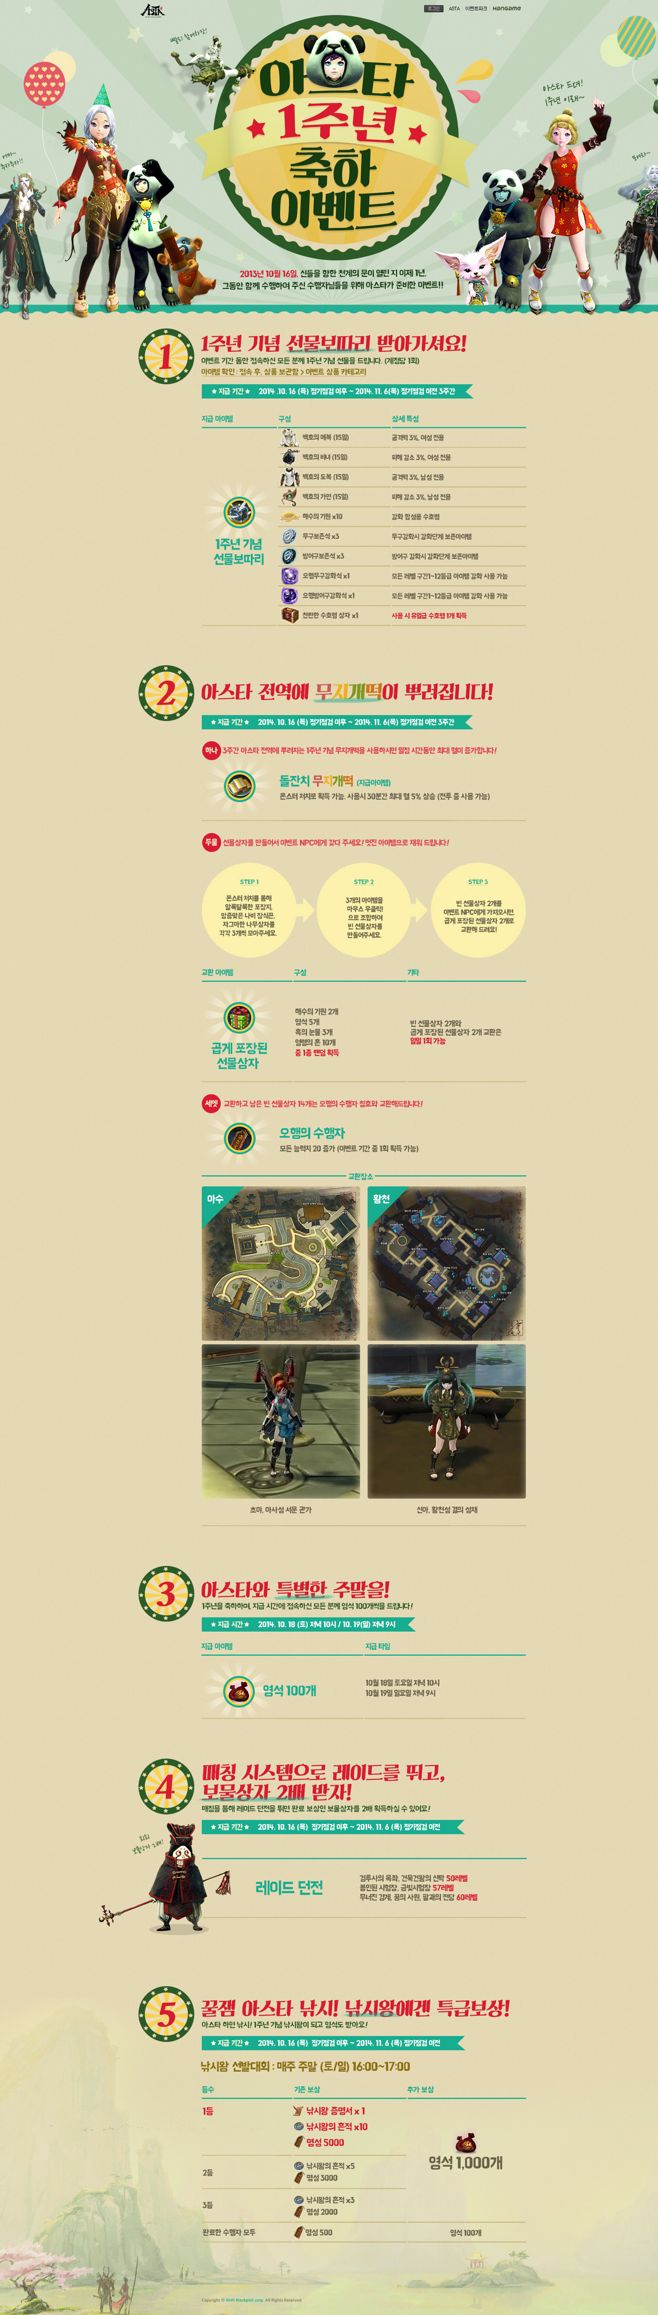 CC樣采集到韩国_Design(1060图)_花瓣UI/UX